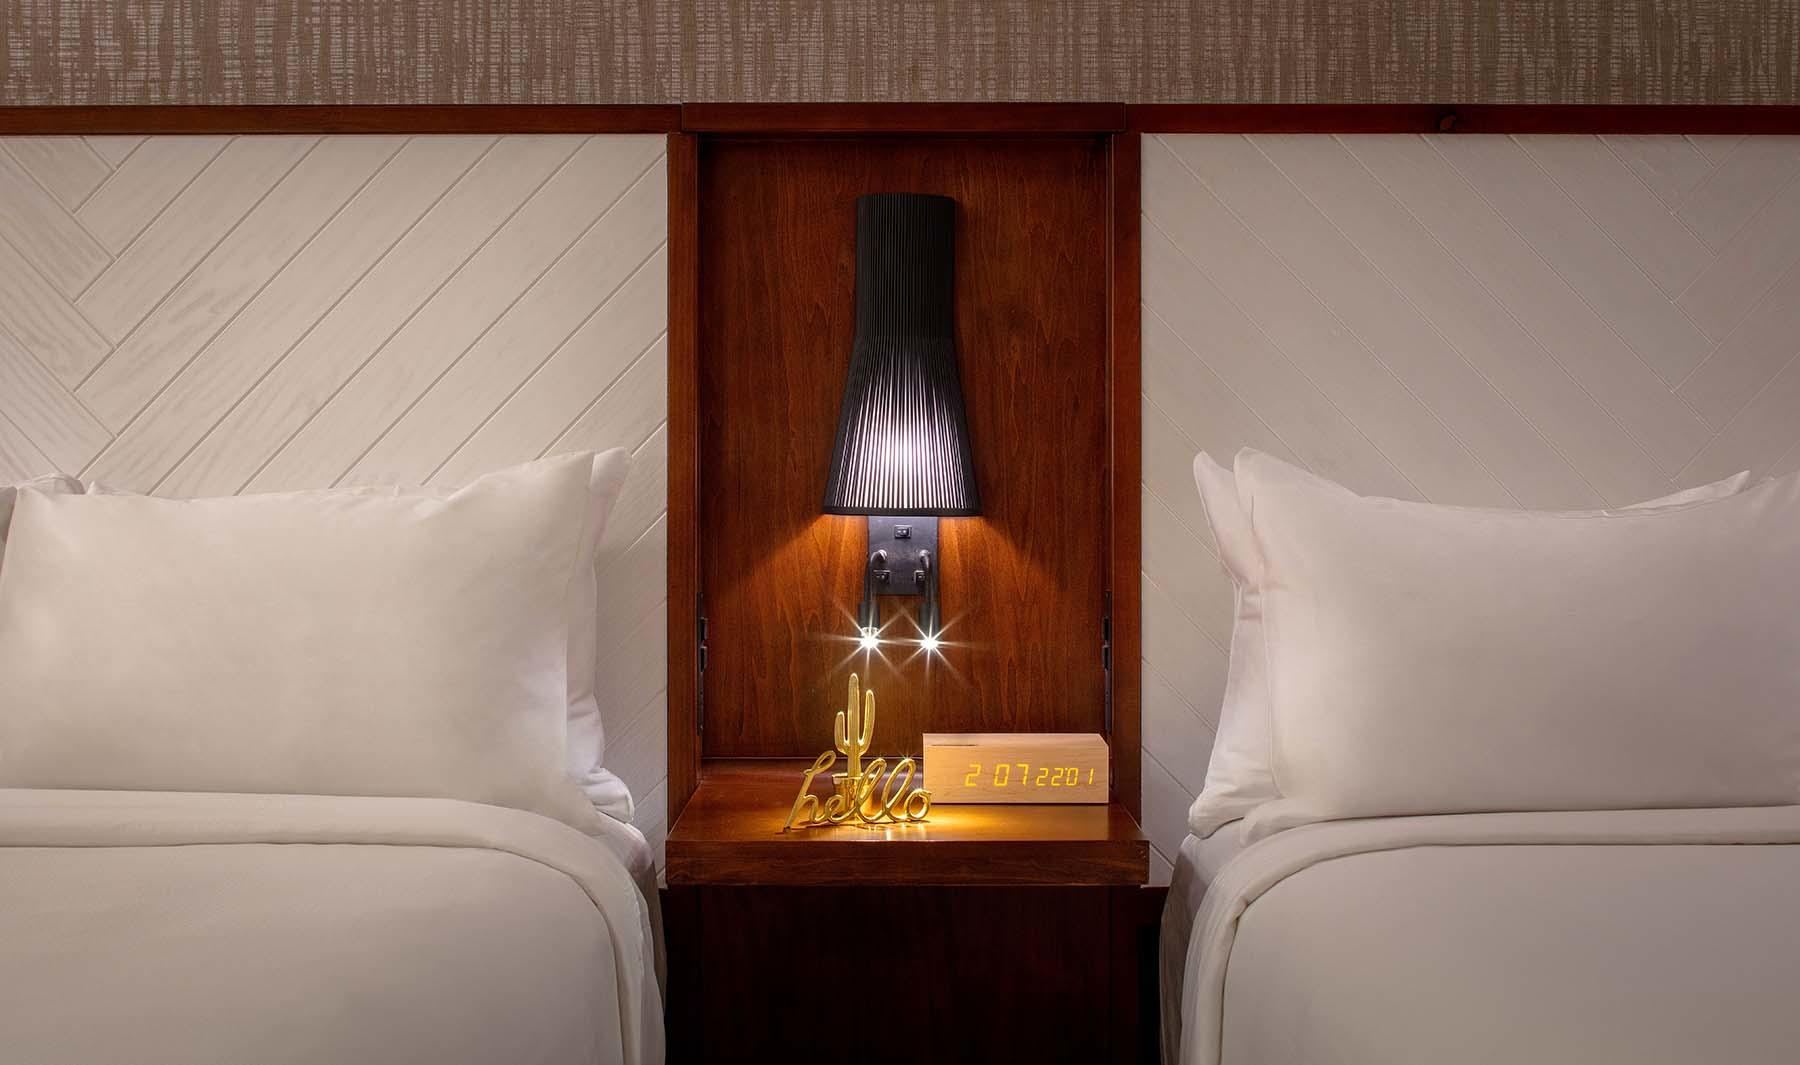 Hotel Adeline image 13